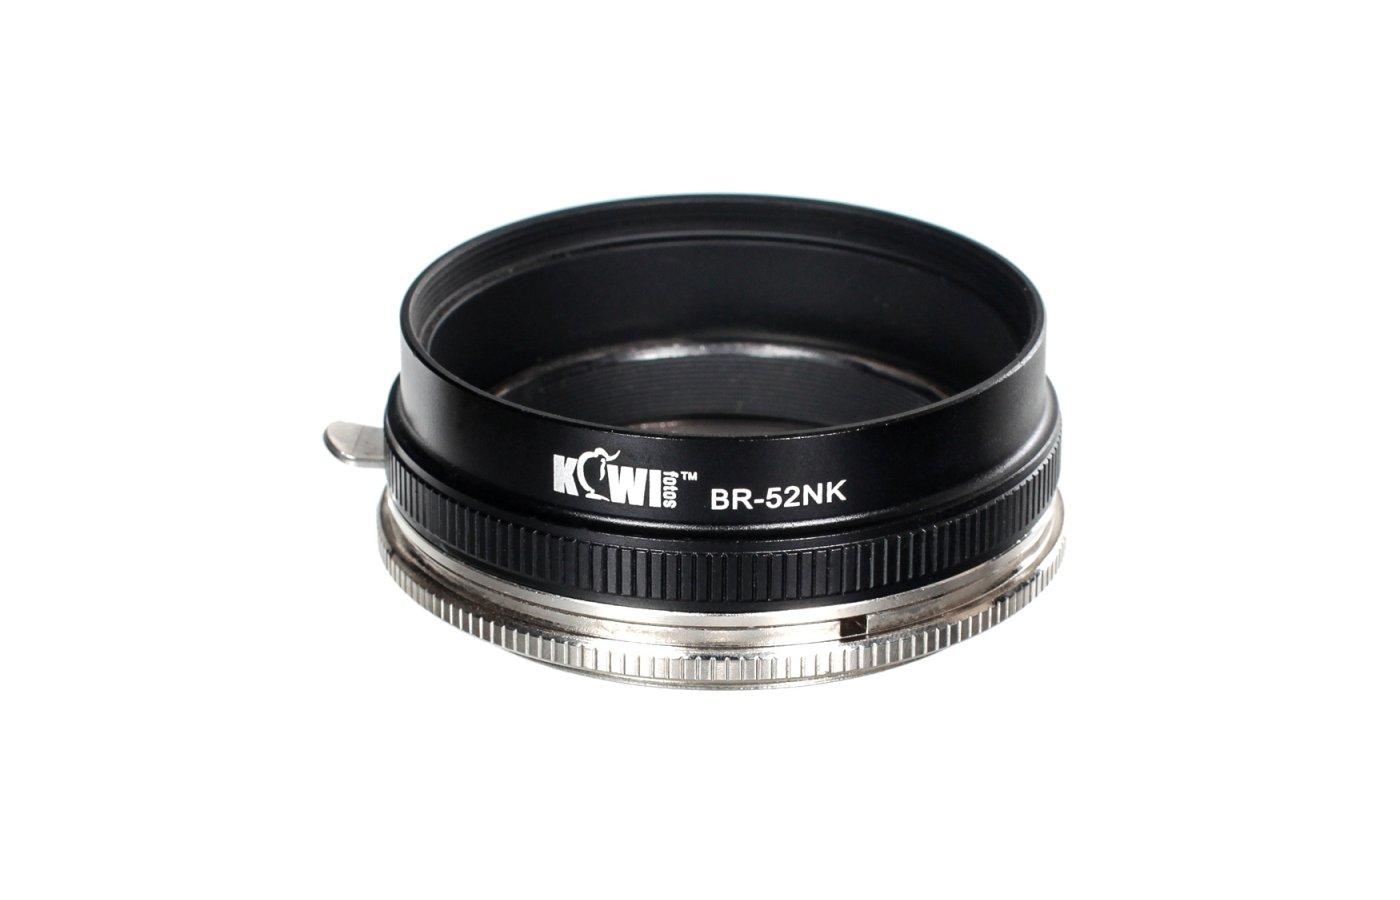 JJC KIWIFOTOS BR-1K Комплект реверсивное кольцо+адаптер фильтра для NIKKOR 52mm